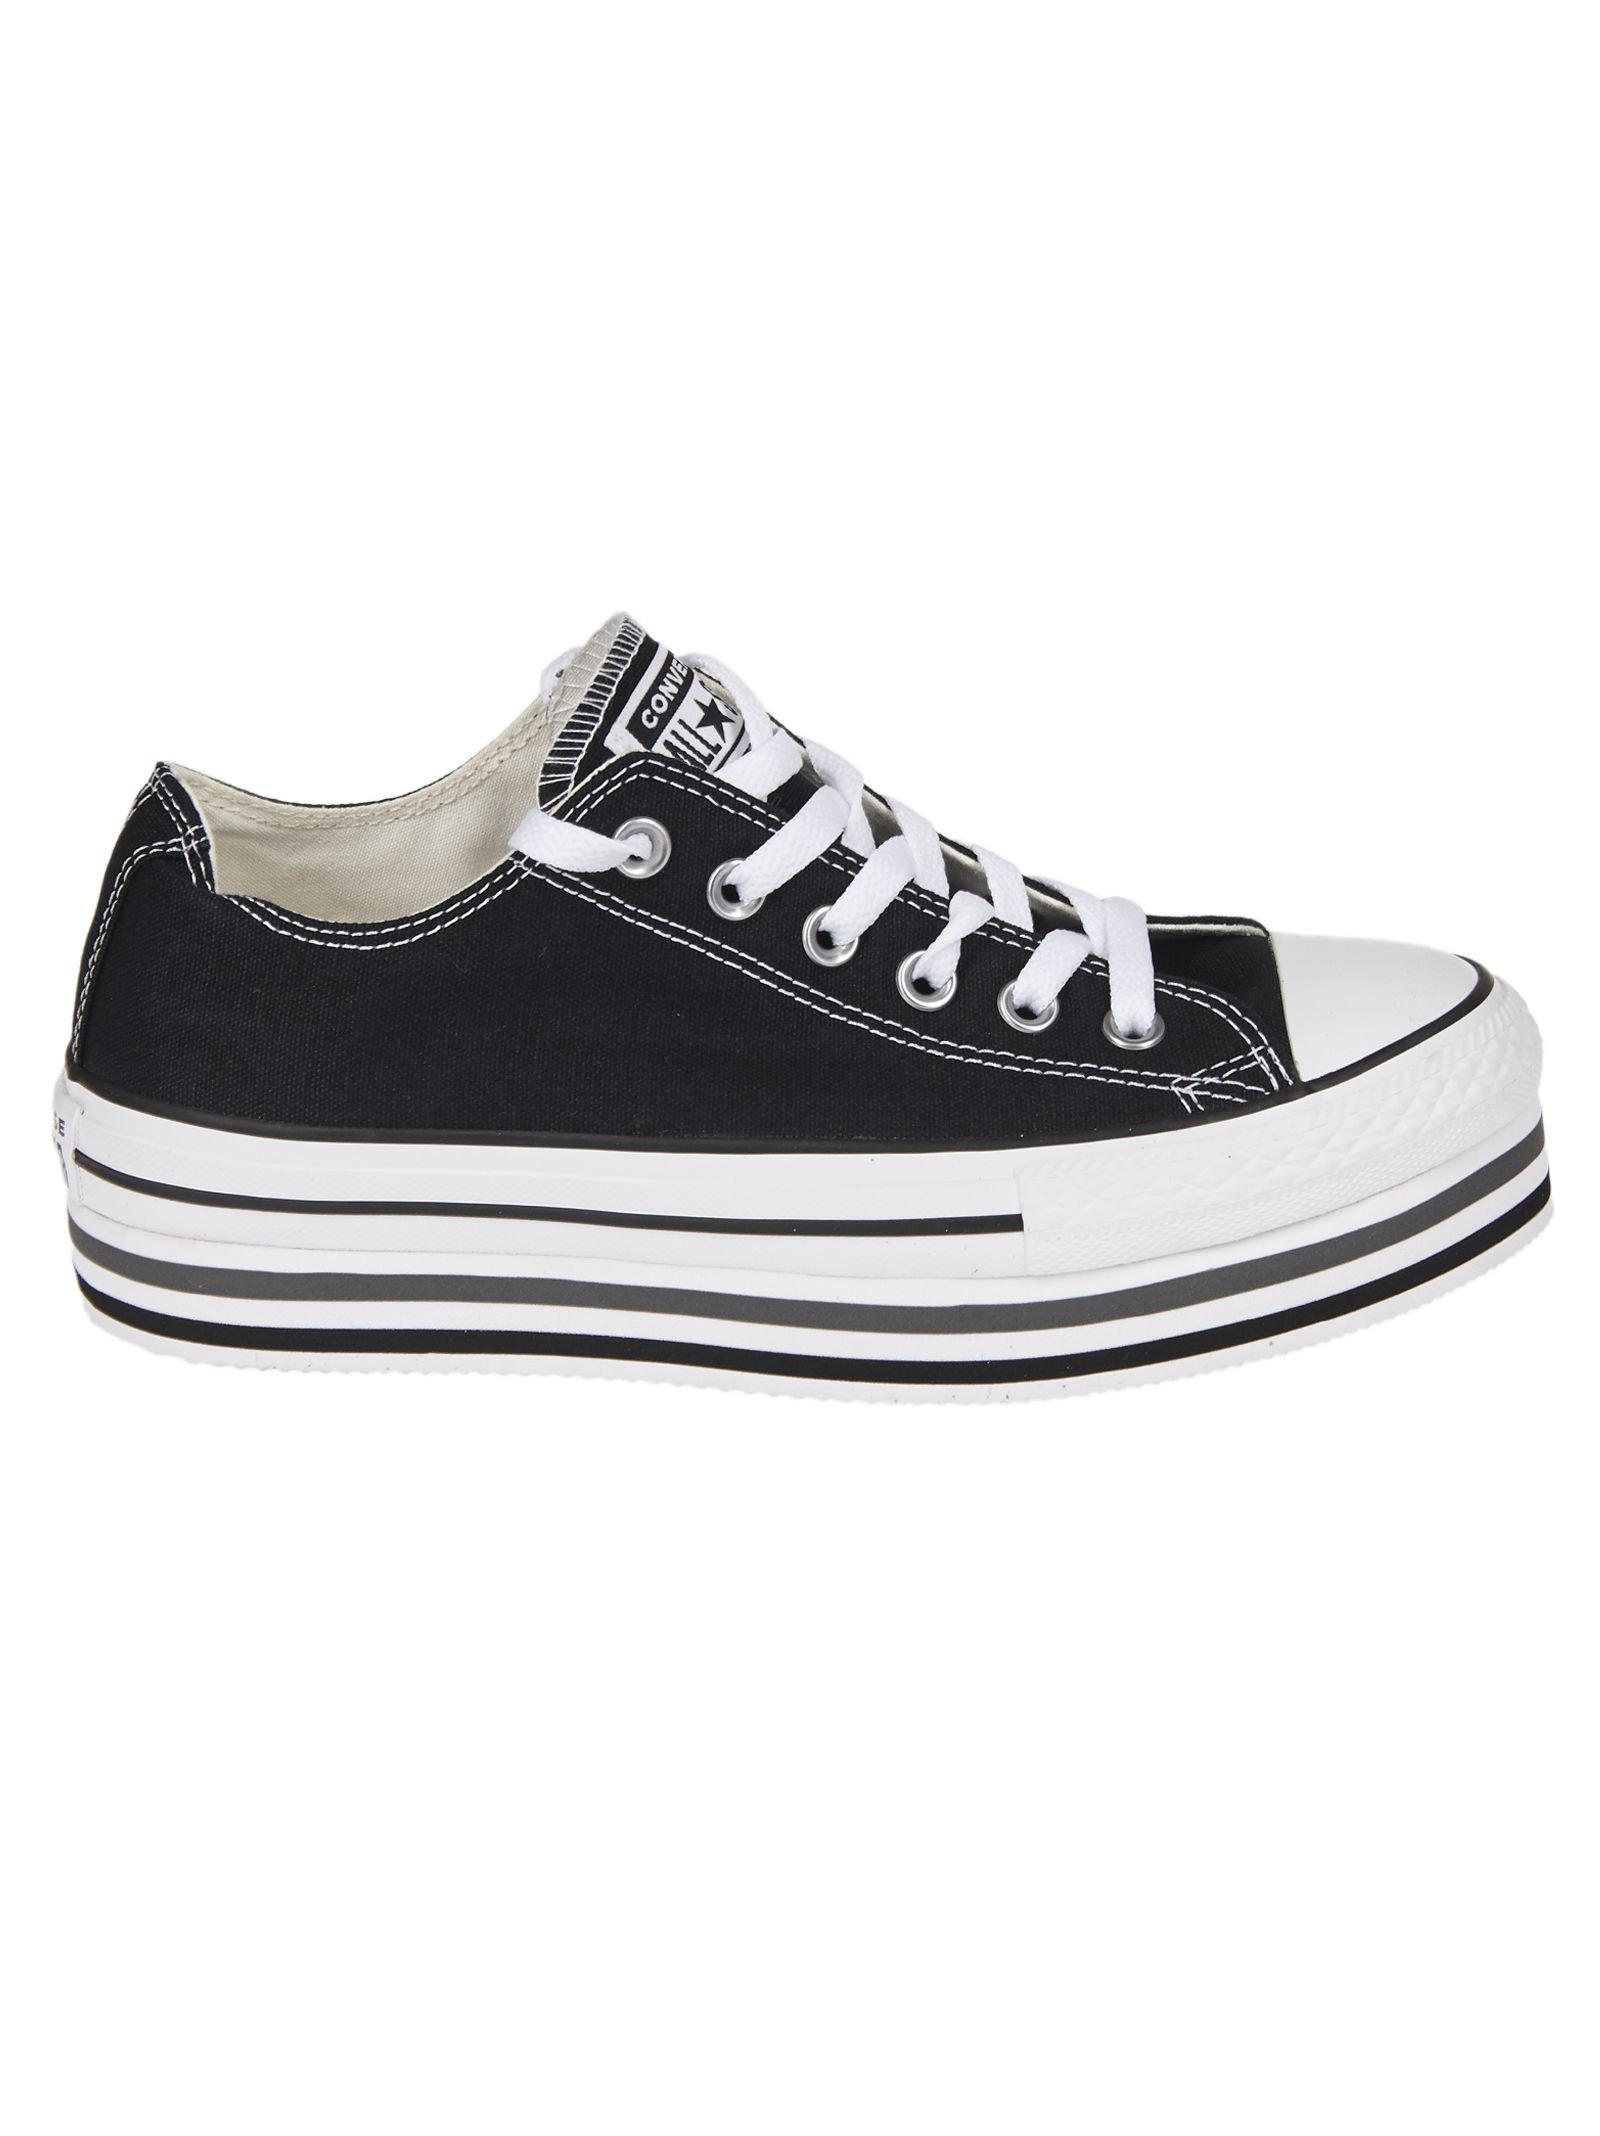 Converse Chuck Taylor All Star Platform Sneakers